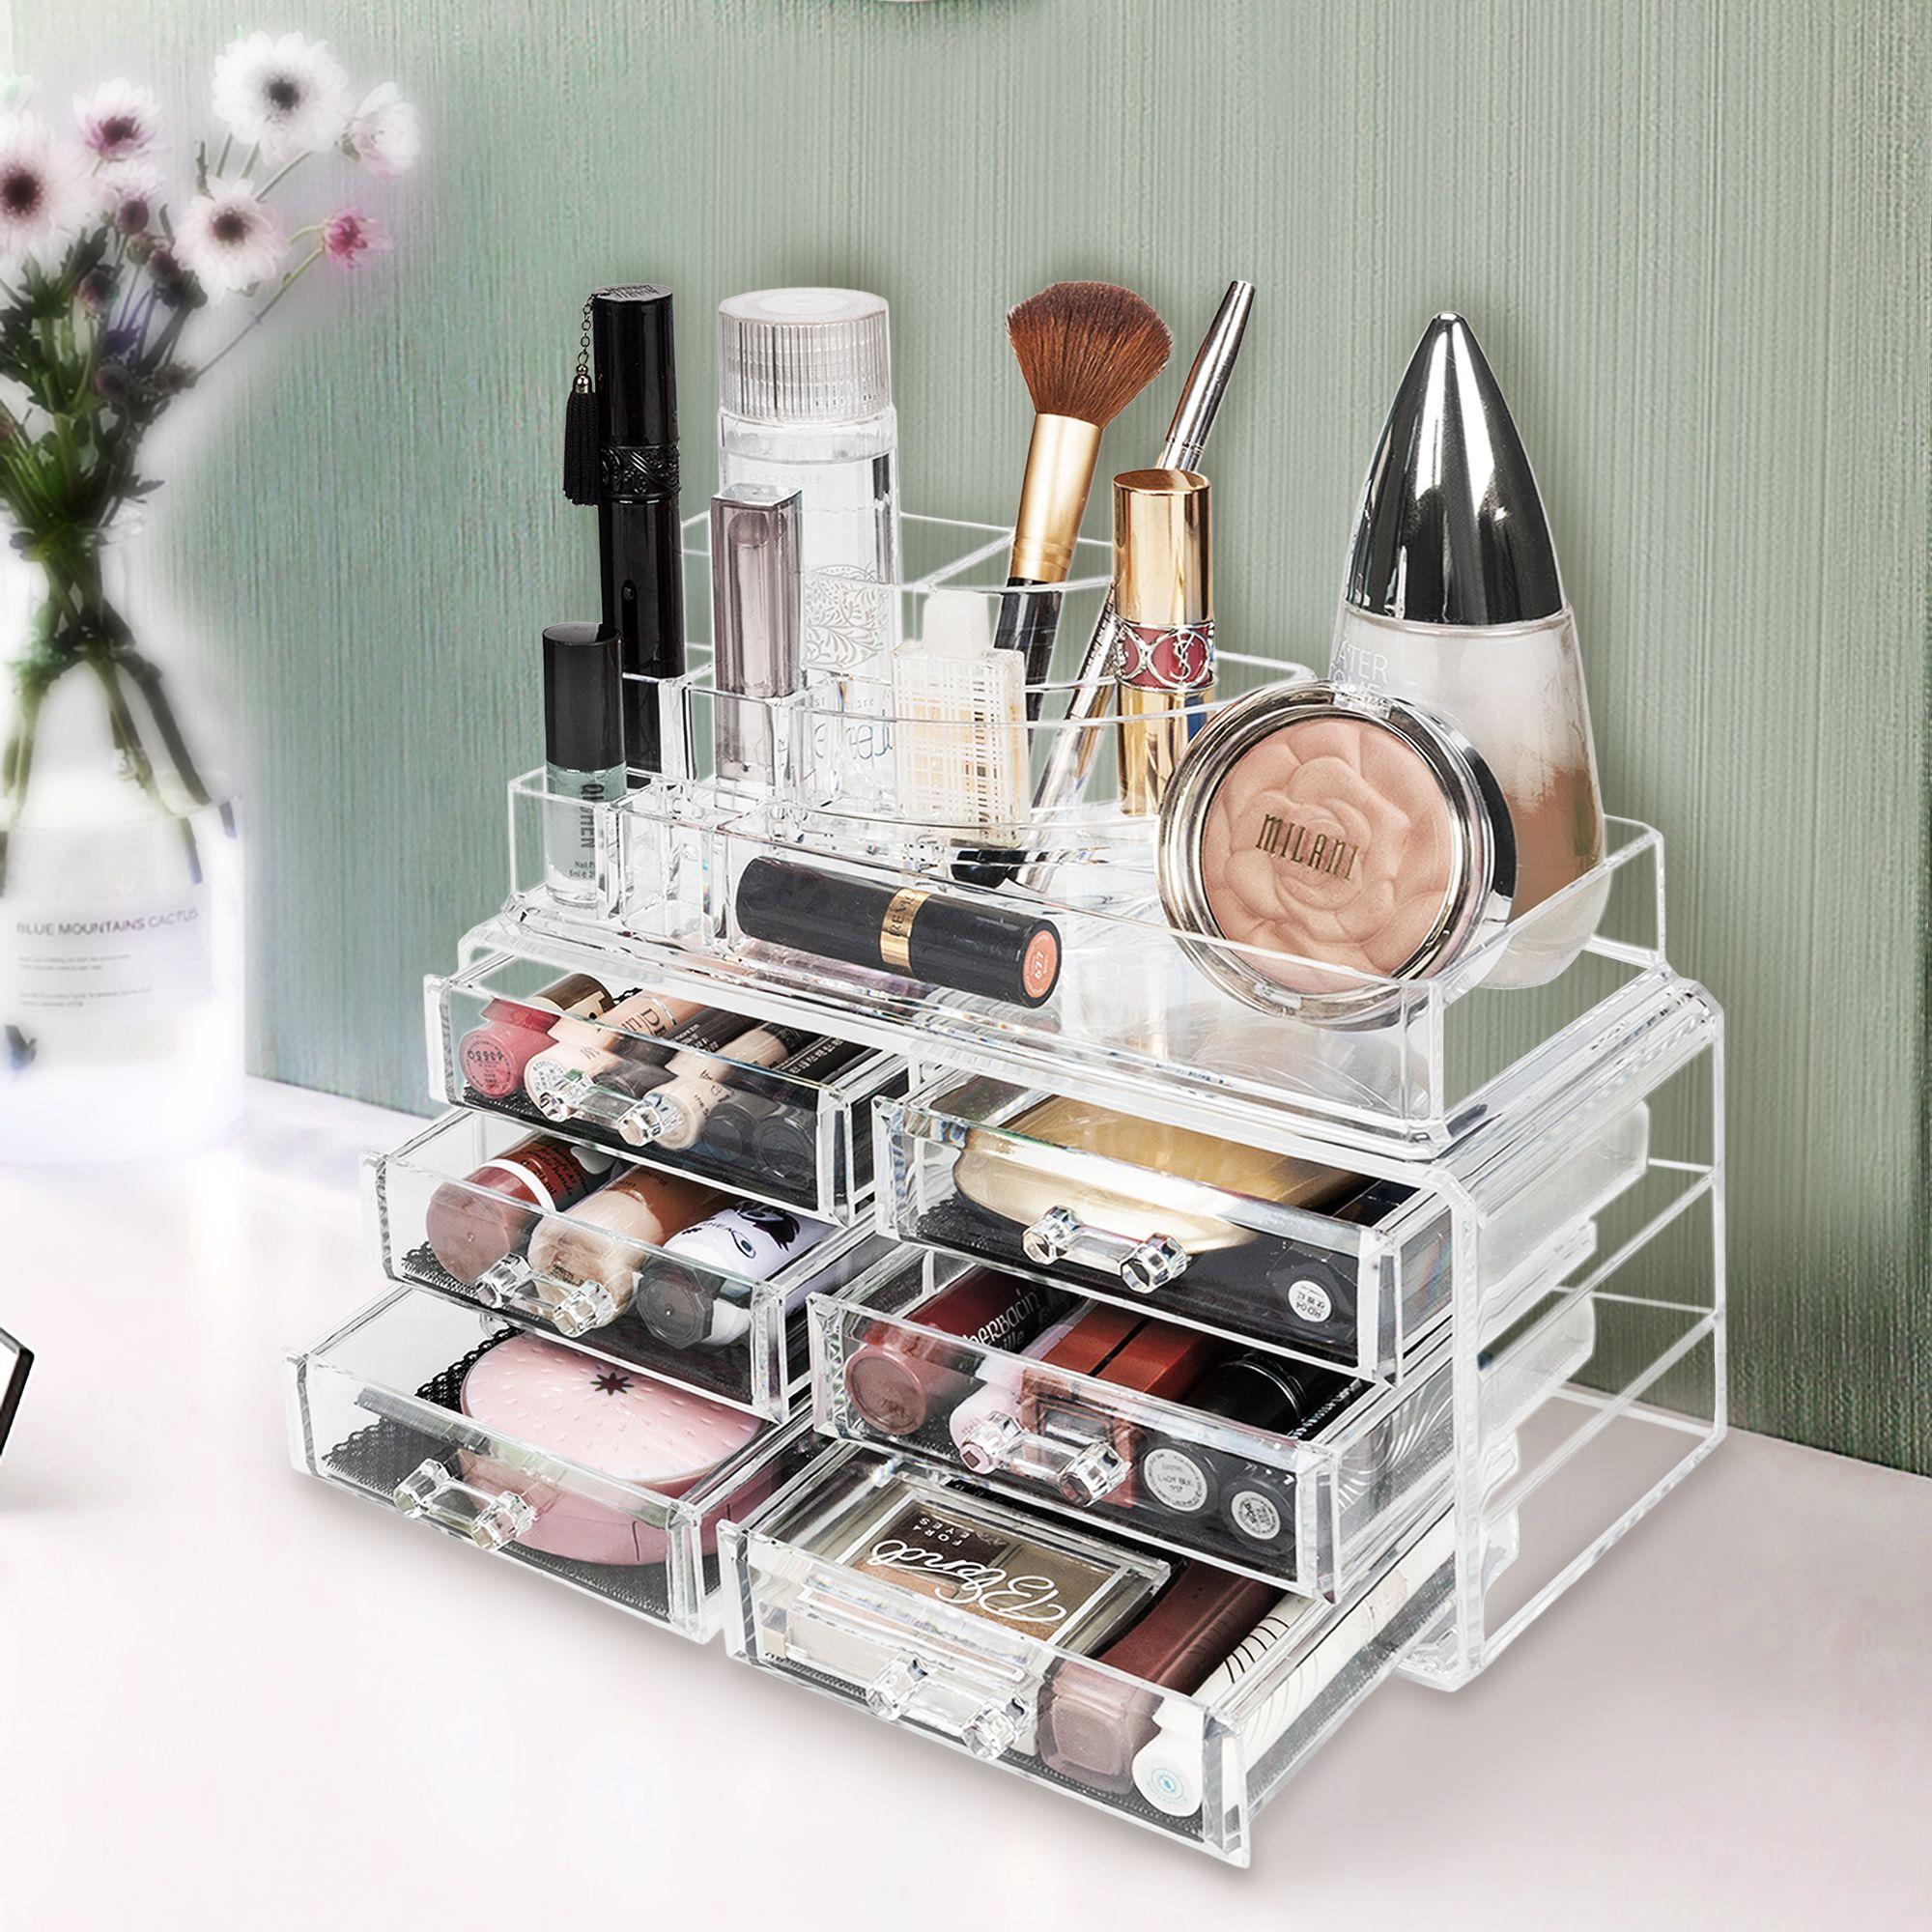 Acrylic Jewelry Makeup Cosmetic Organizer Case Display